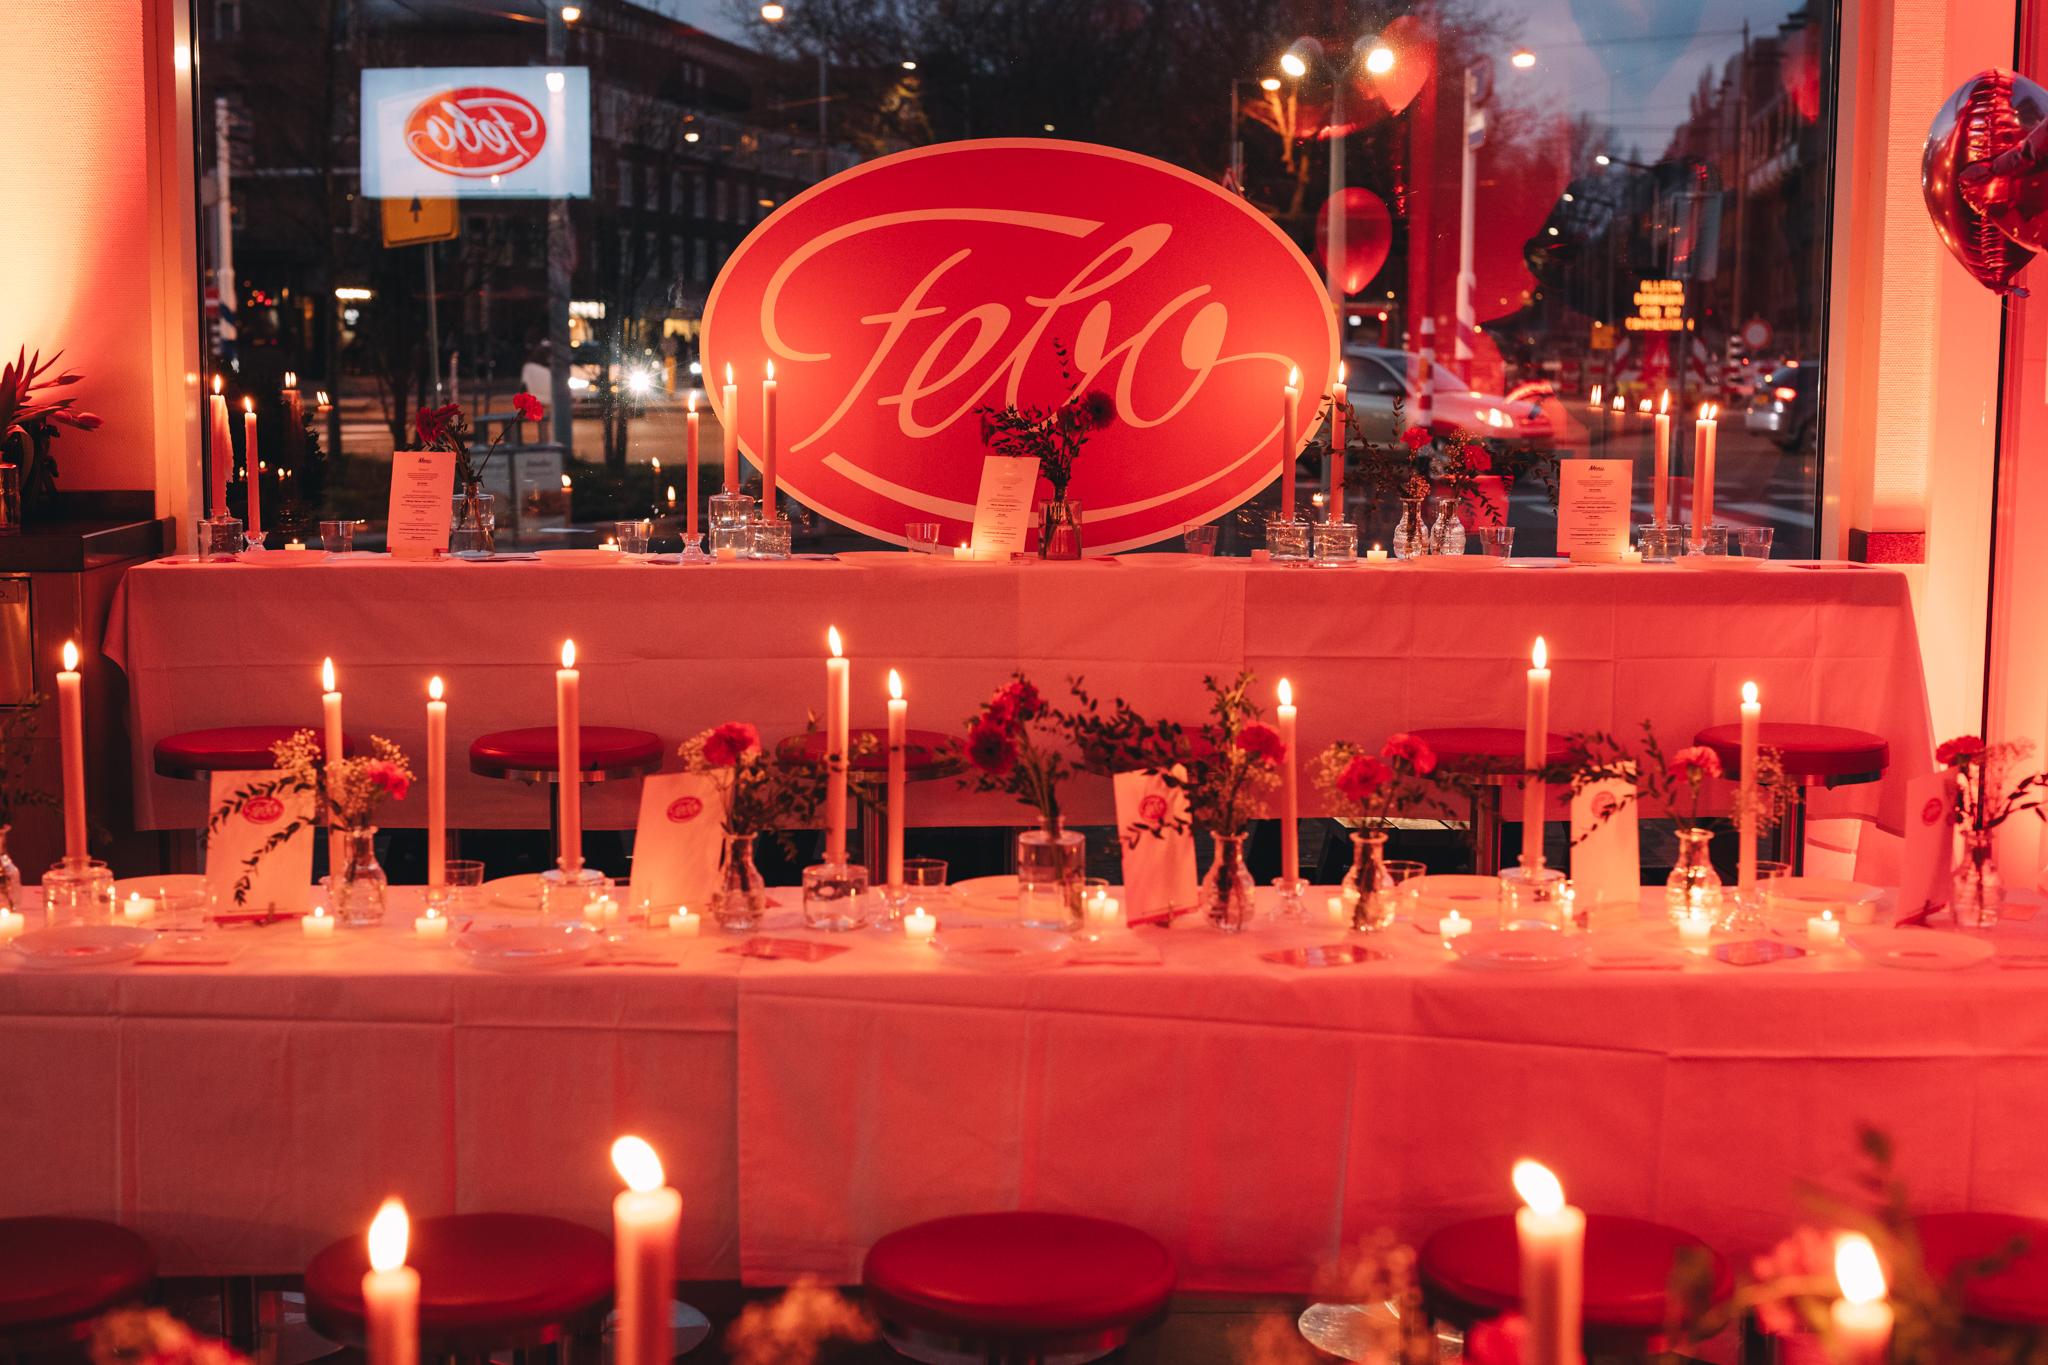 FEBO Valentijn